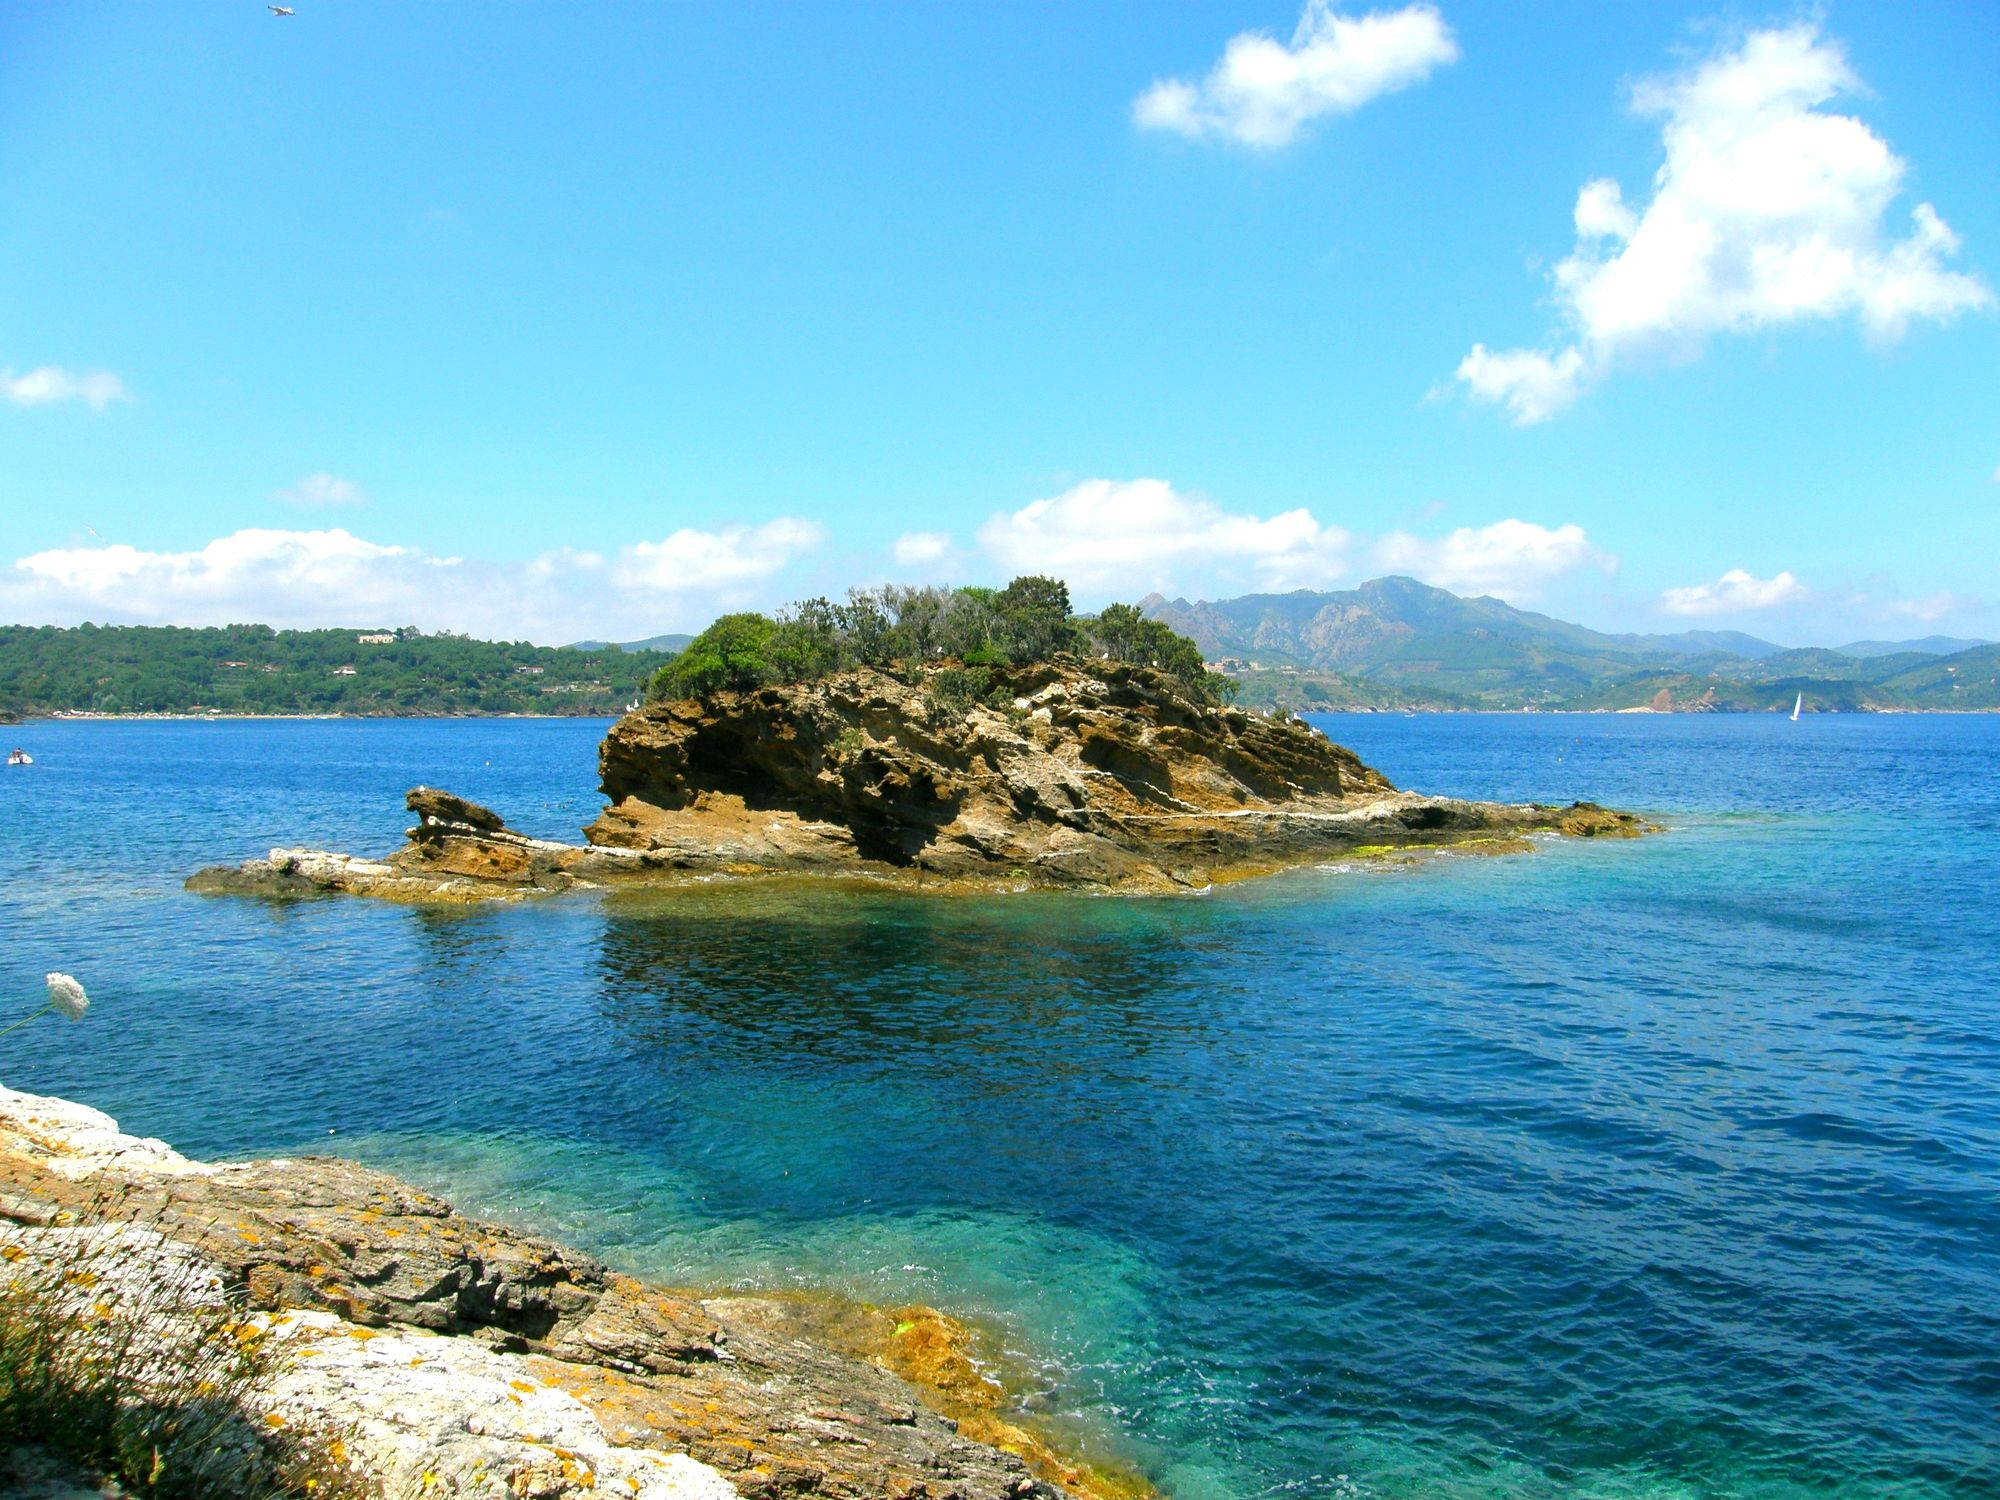 Bild mit Natur, Natur, Gewässer, Urlaub, Meerblick, Meer, Insel, Ferien, island